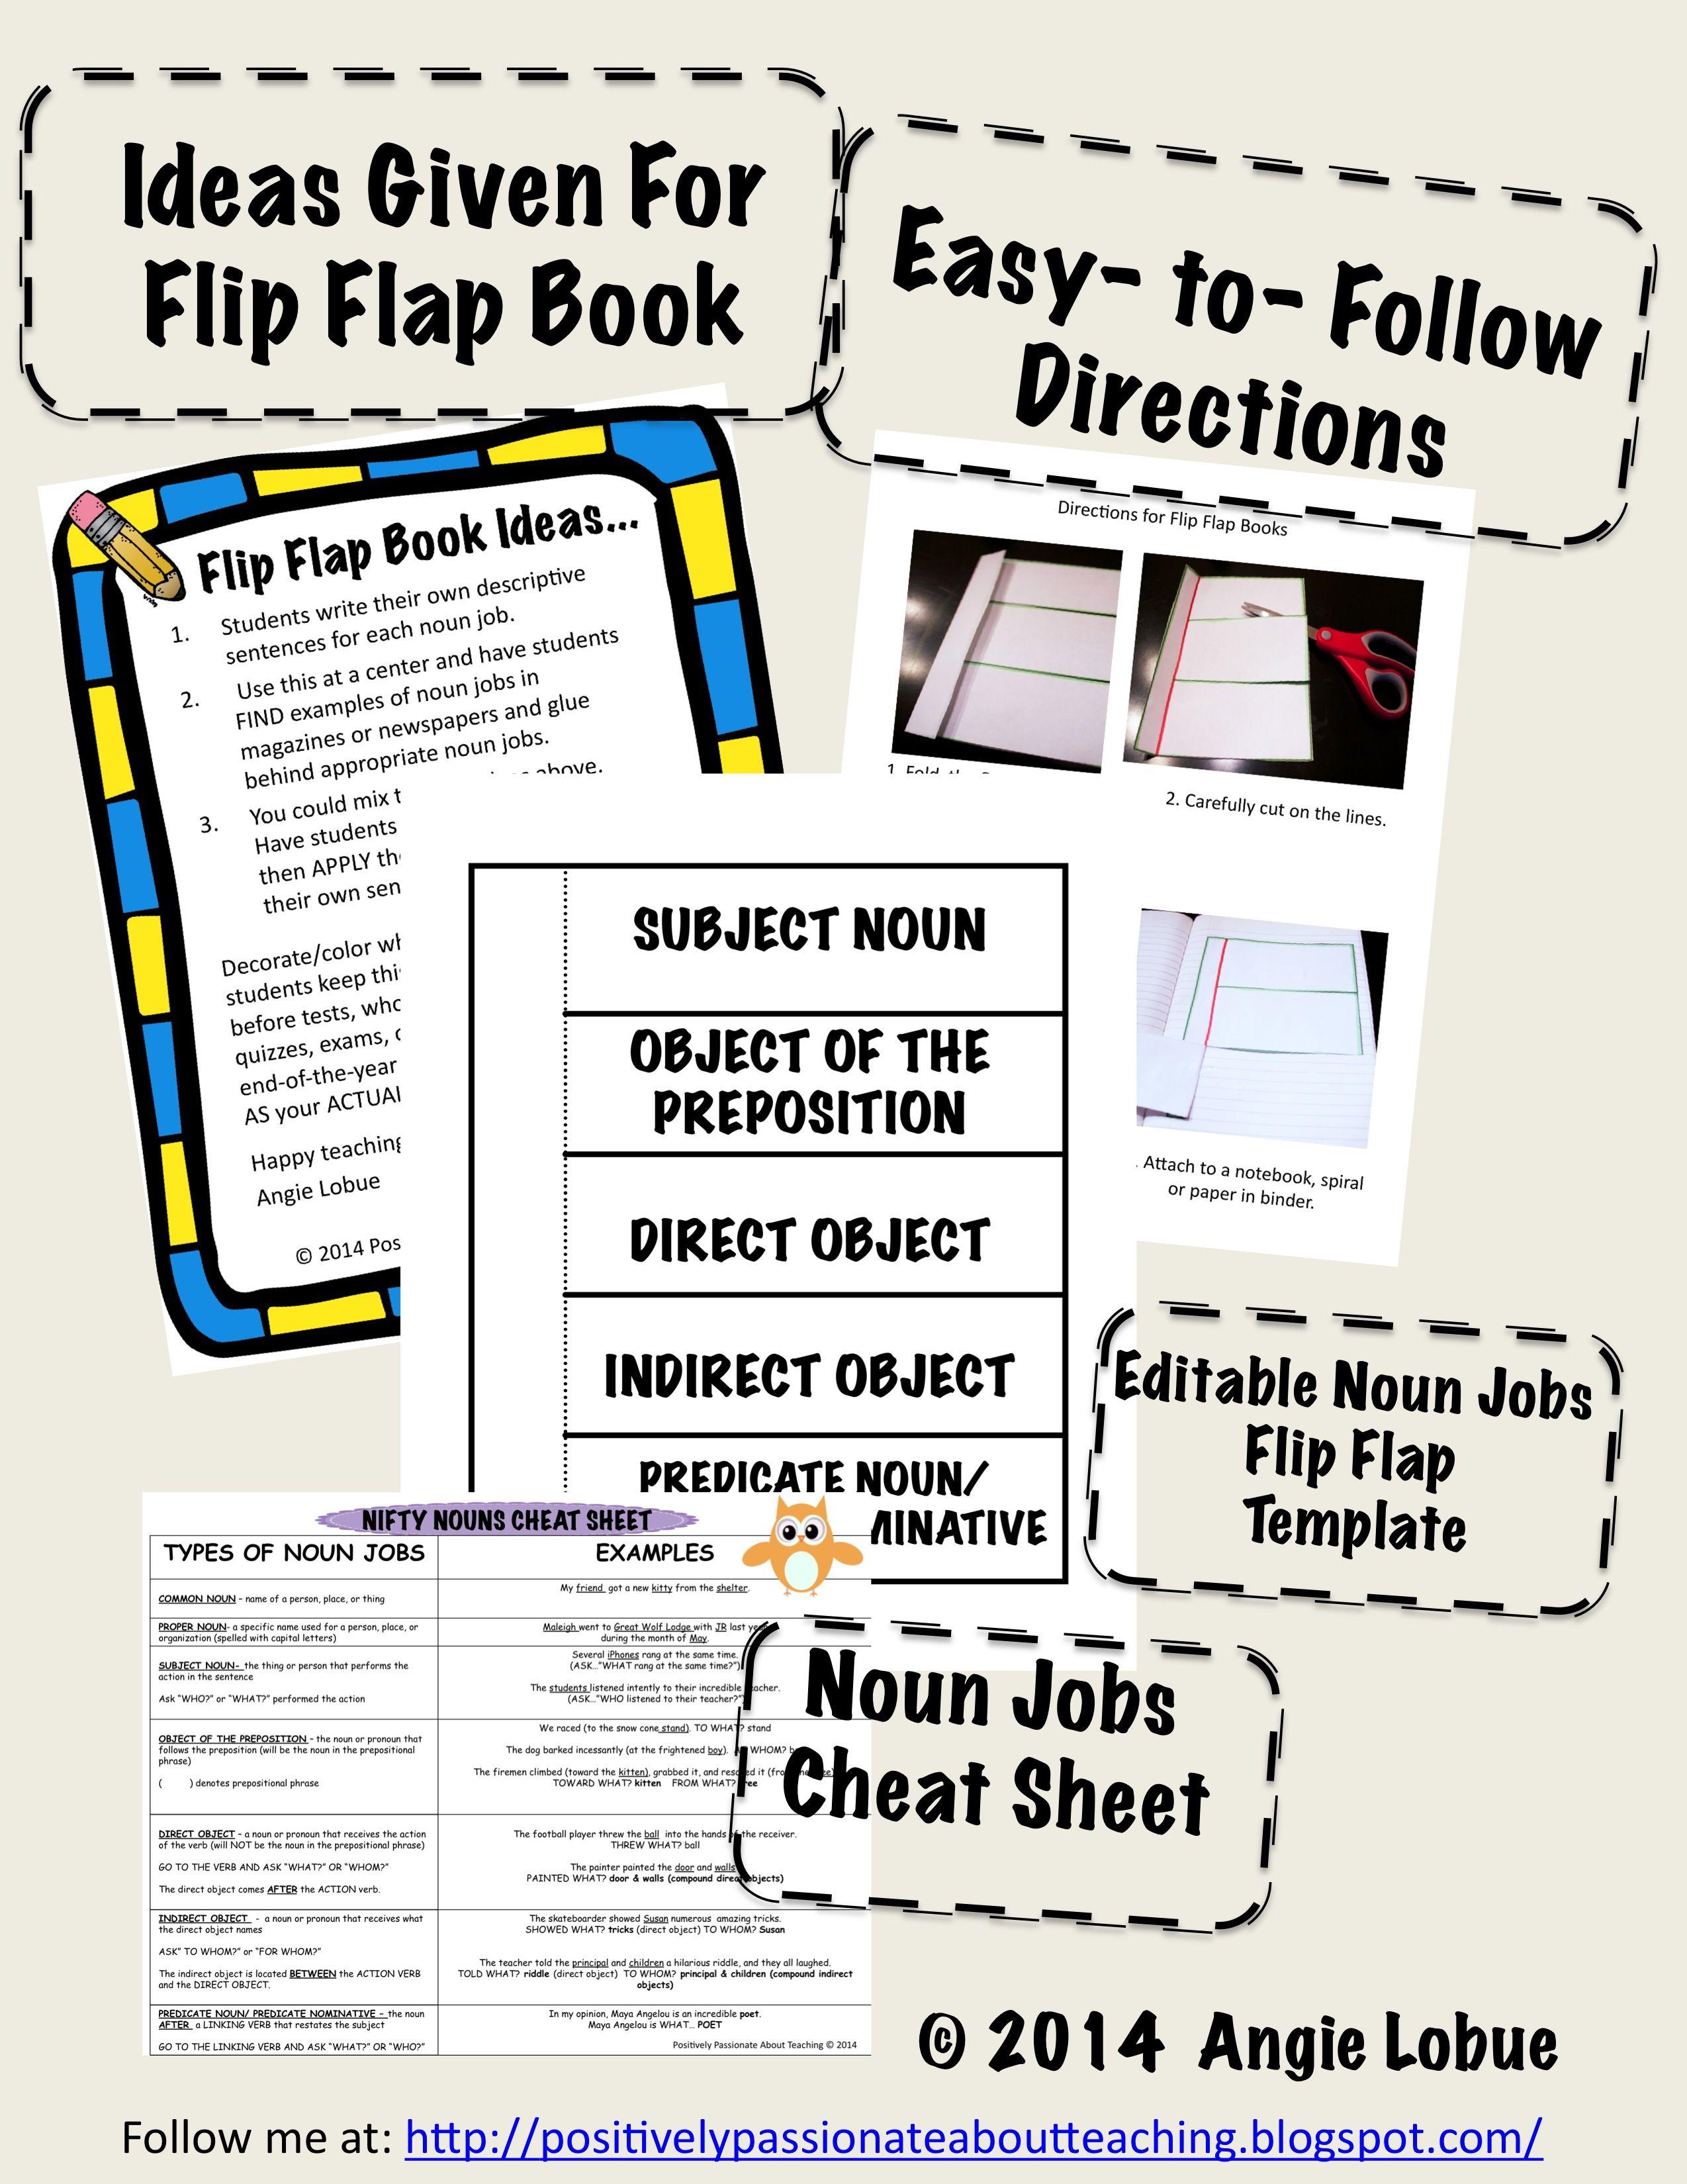 Interactive Noun Jobs Flip Flap Book Template And Noun